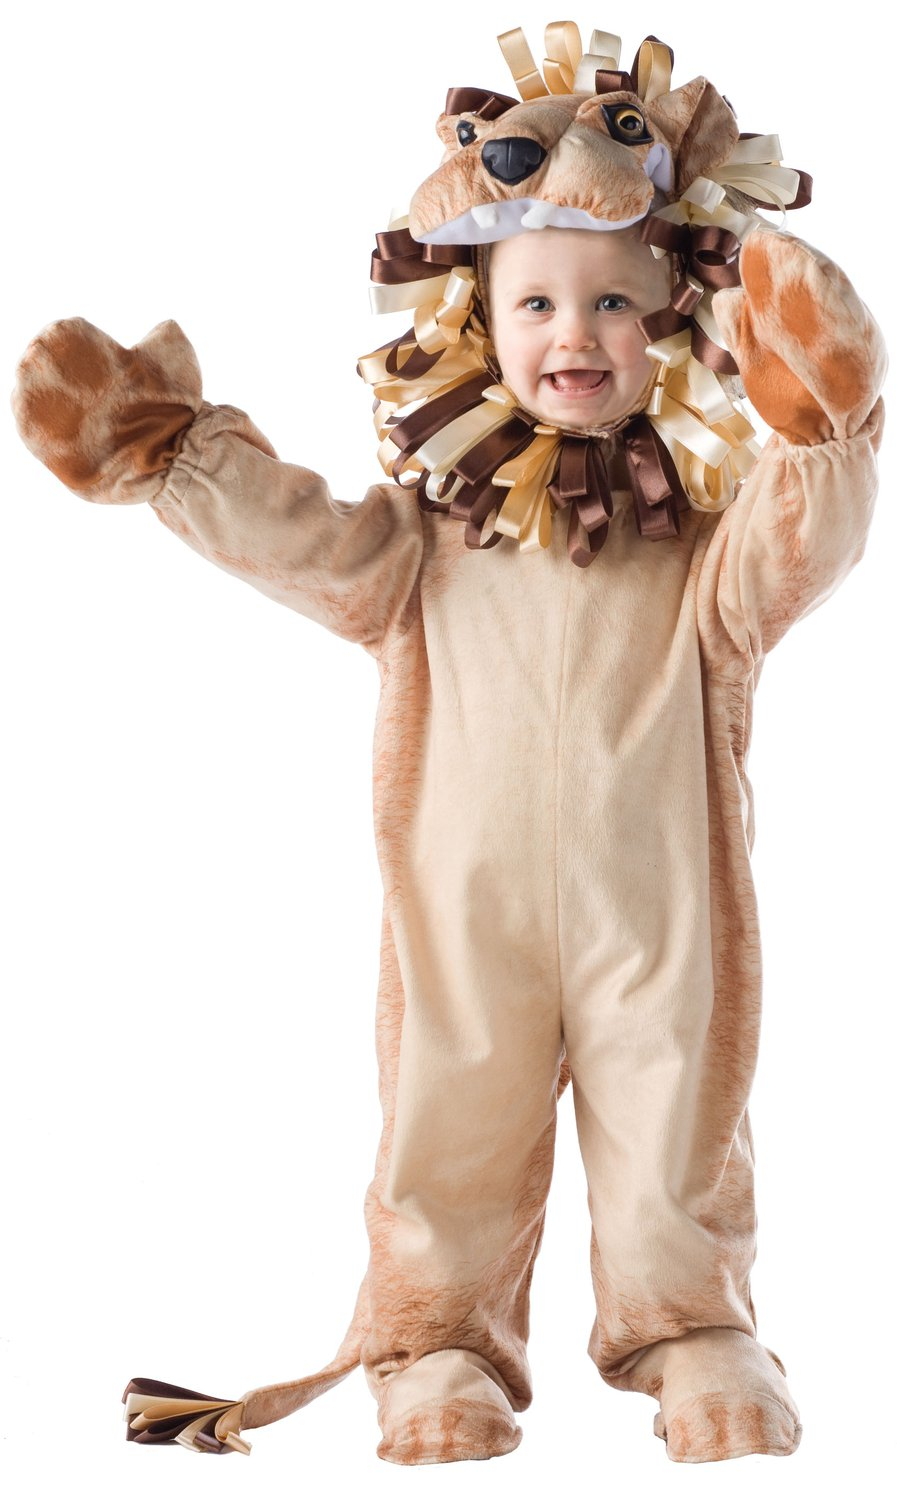 ... lion costume for kids boys funny lion kids costume ...  sc 1 st  Best Kids Costumes & Lion Kid Costume - Best Kids Costumes